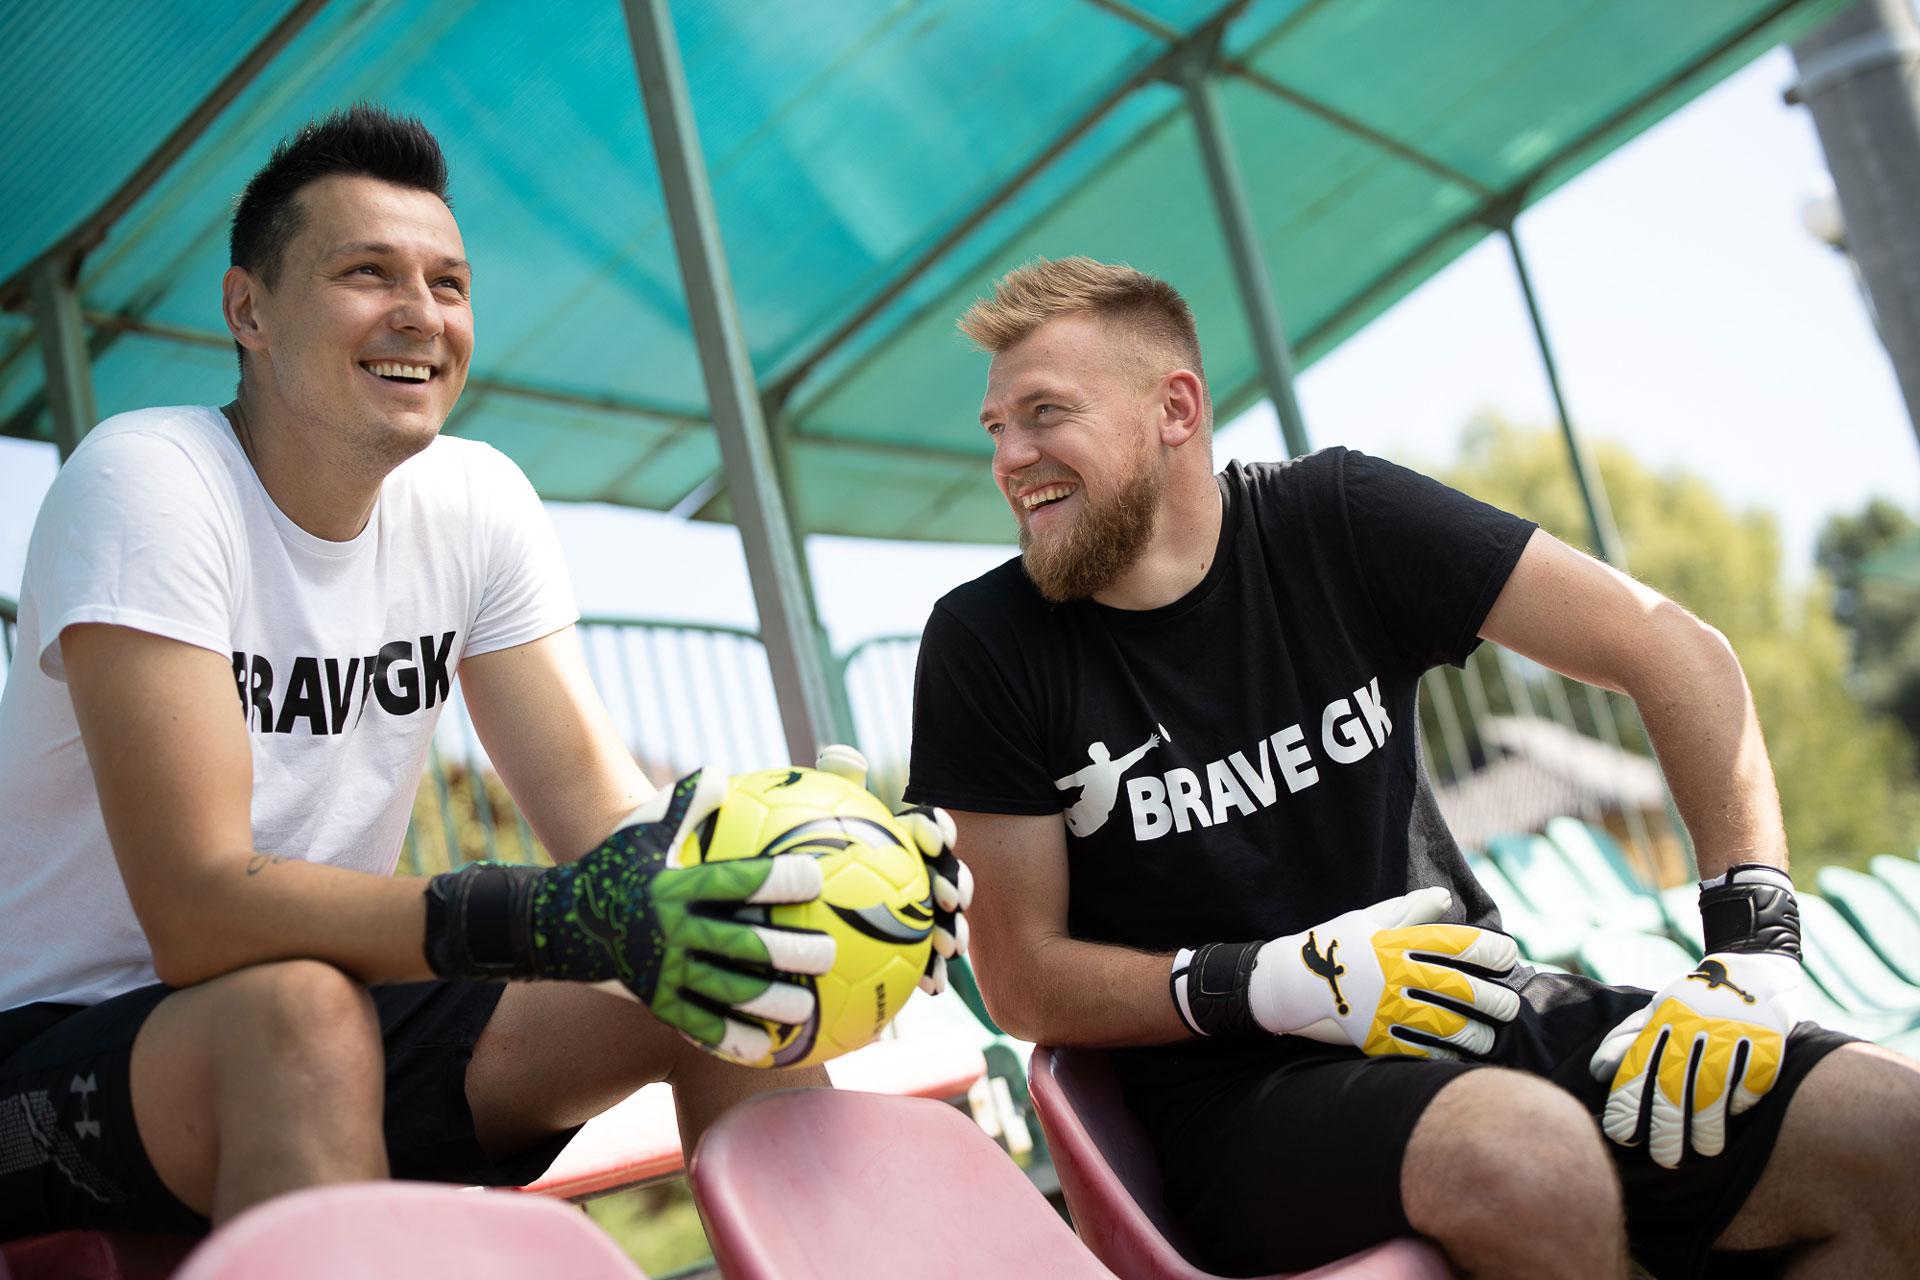 Рустам Худжамов випустив нову колекцію воротарських рукавиць - магазин Brave GK